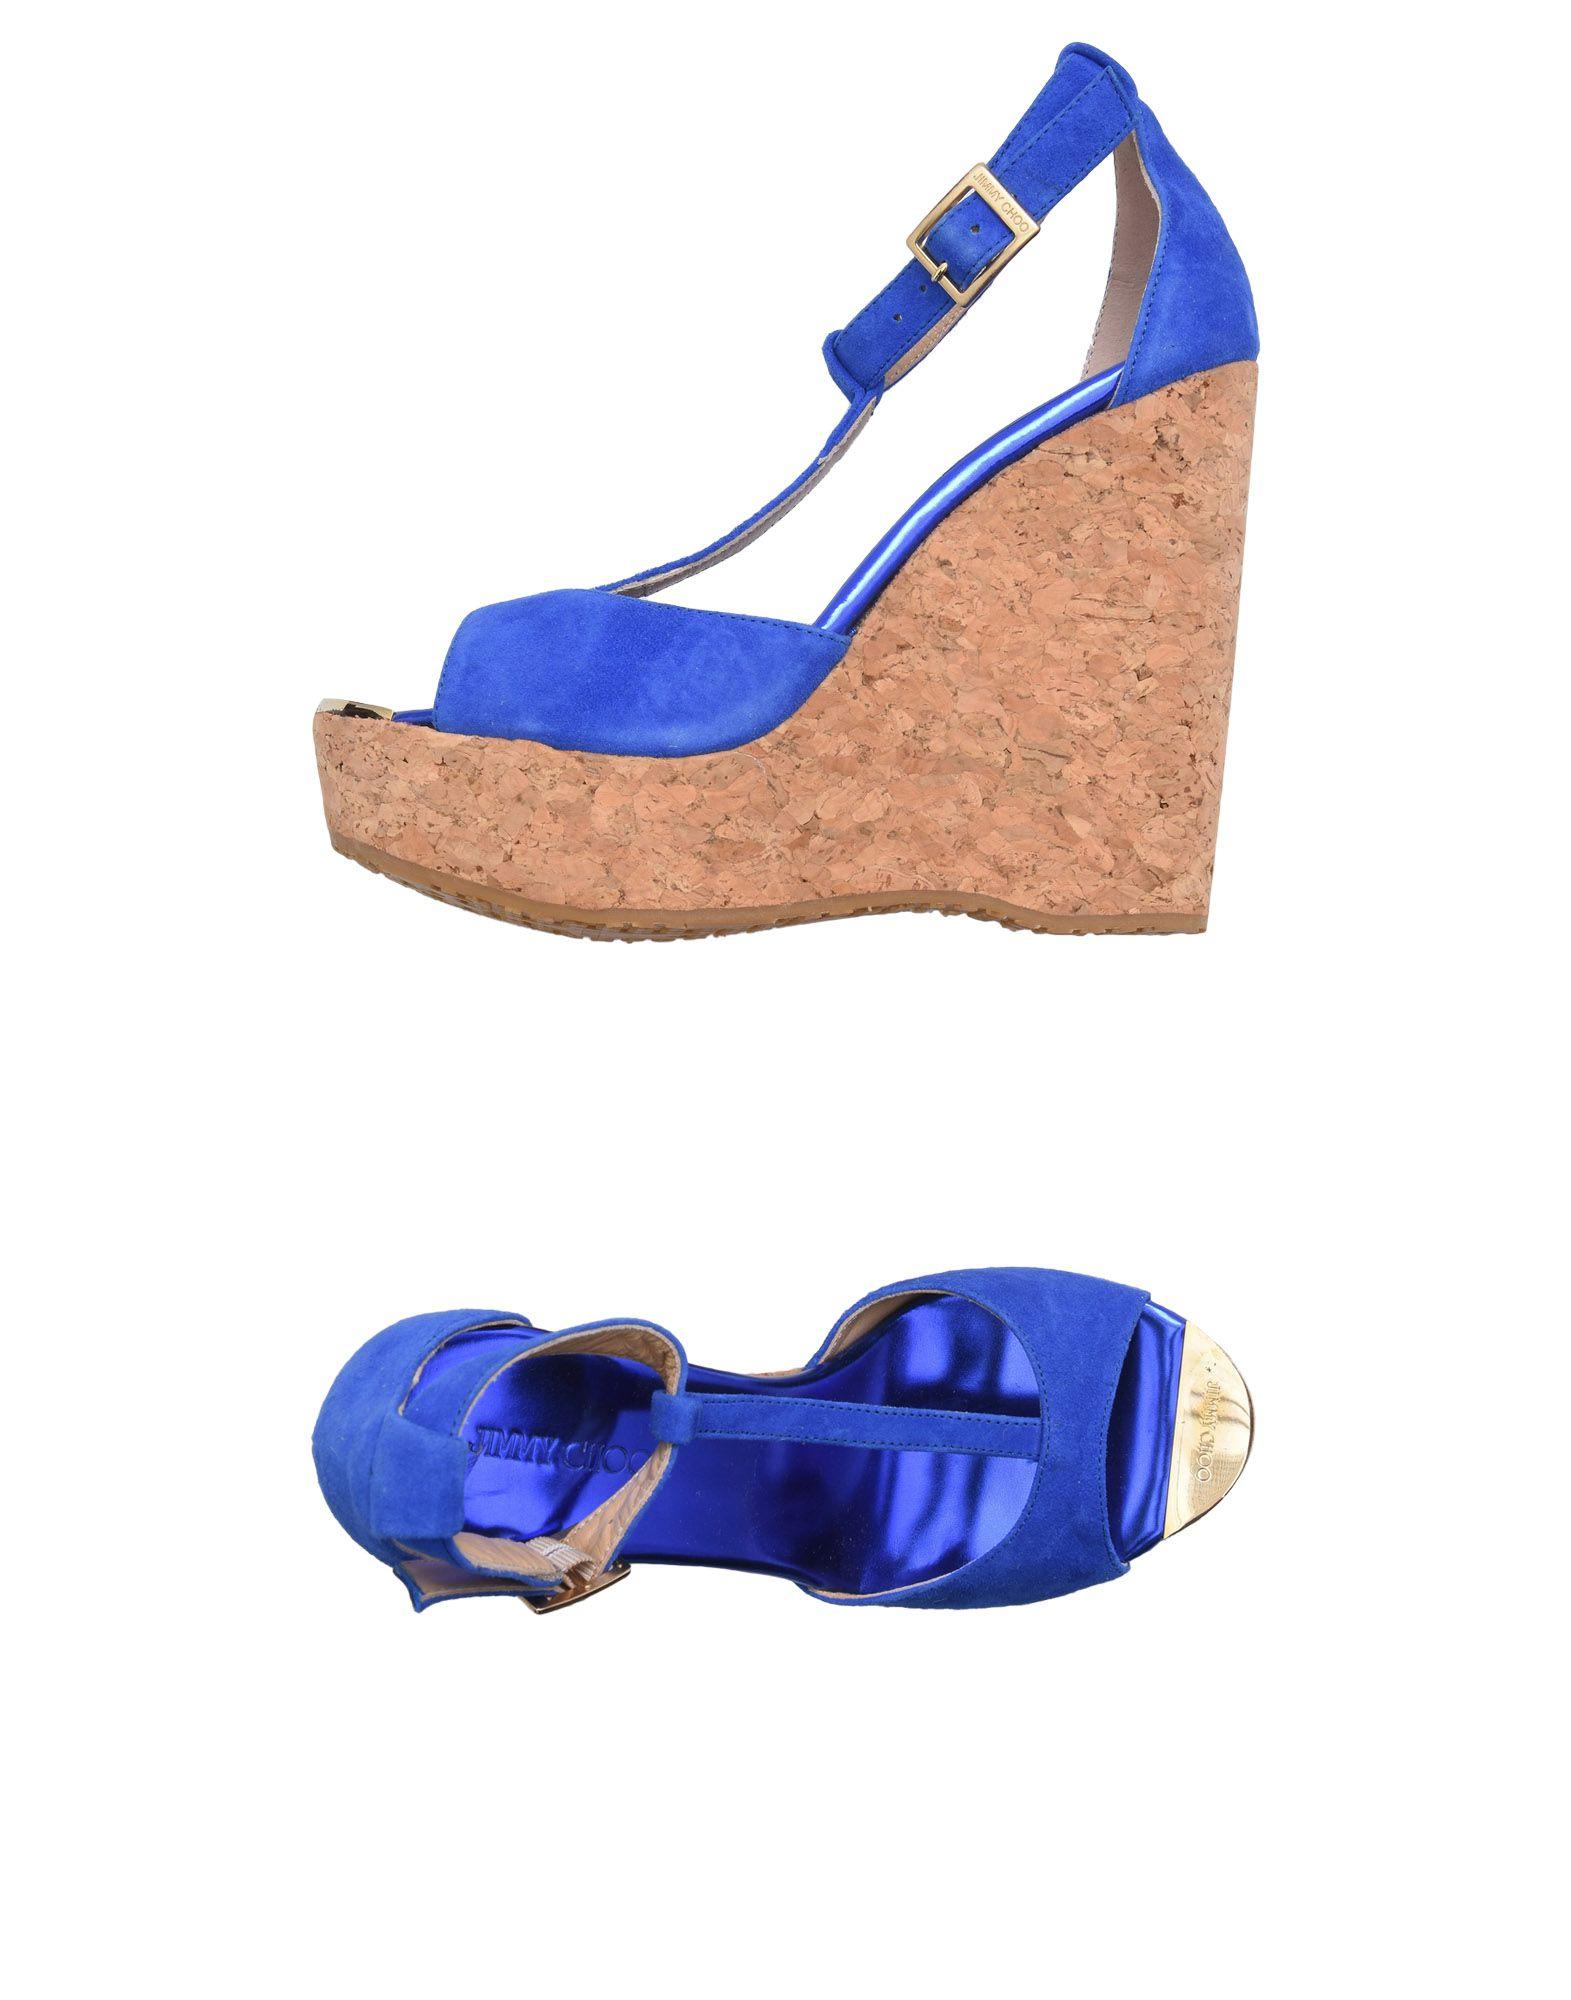 Jimmy Jimmy Choo Sandals - Women Jimmy Jimmy Choo Sandals online on  United Kingdom - 11478690XE c575df